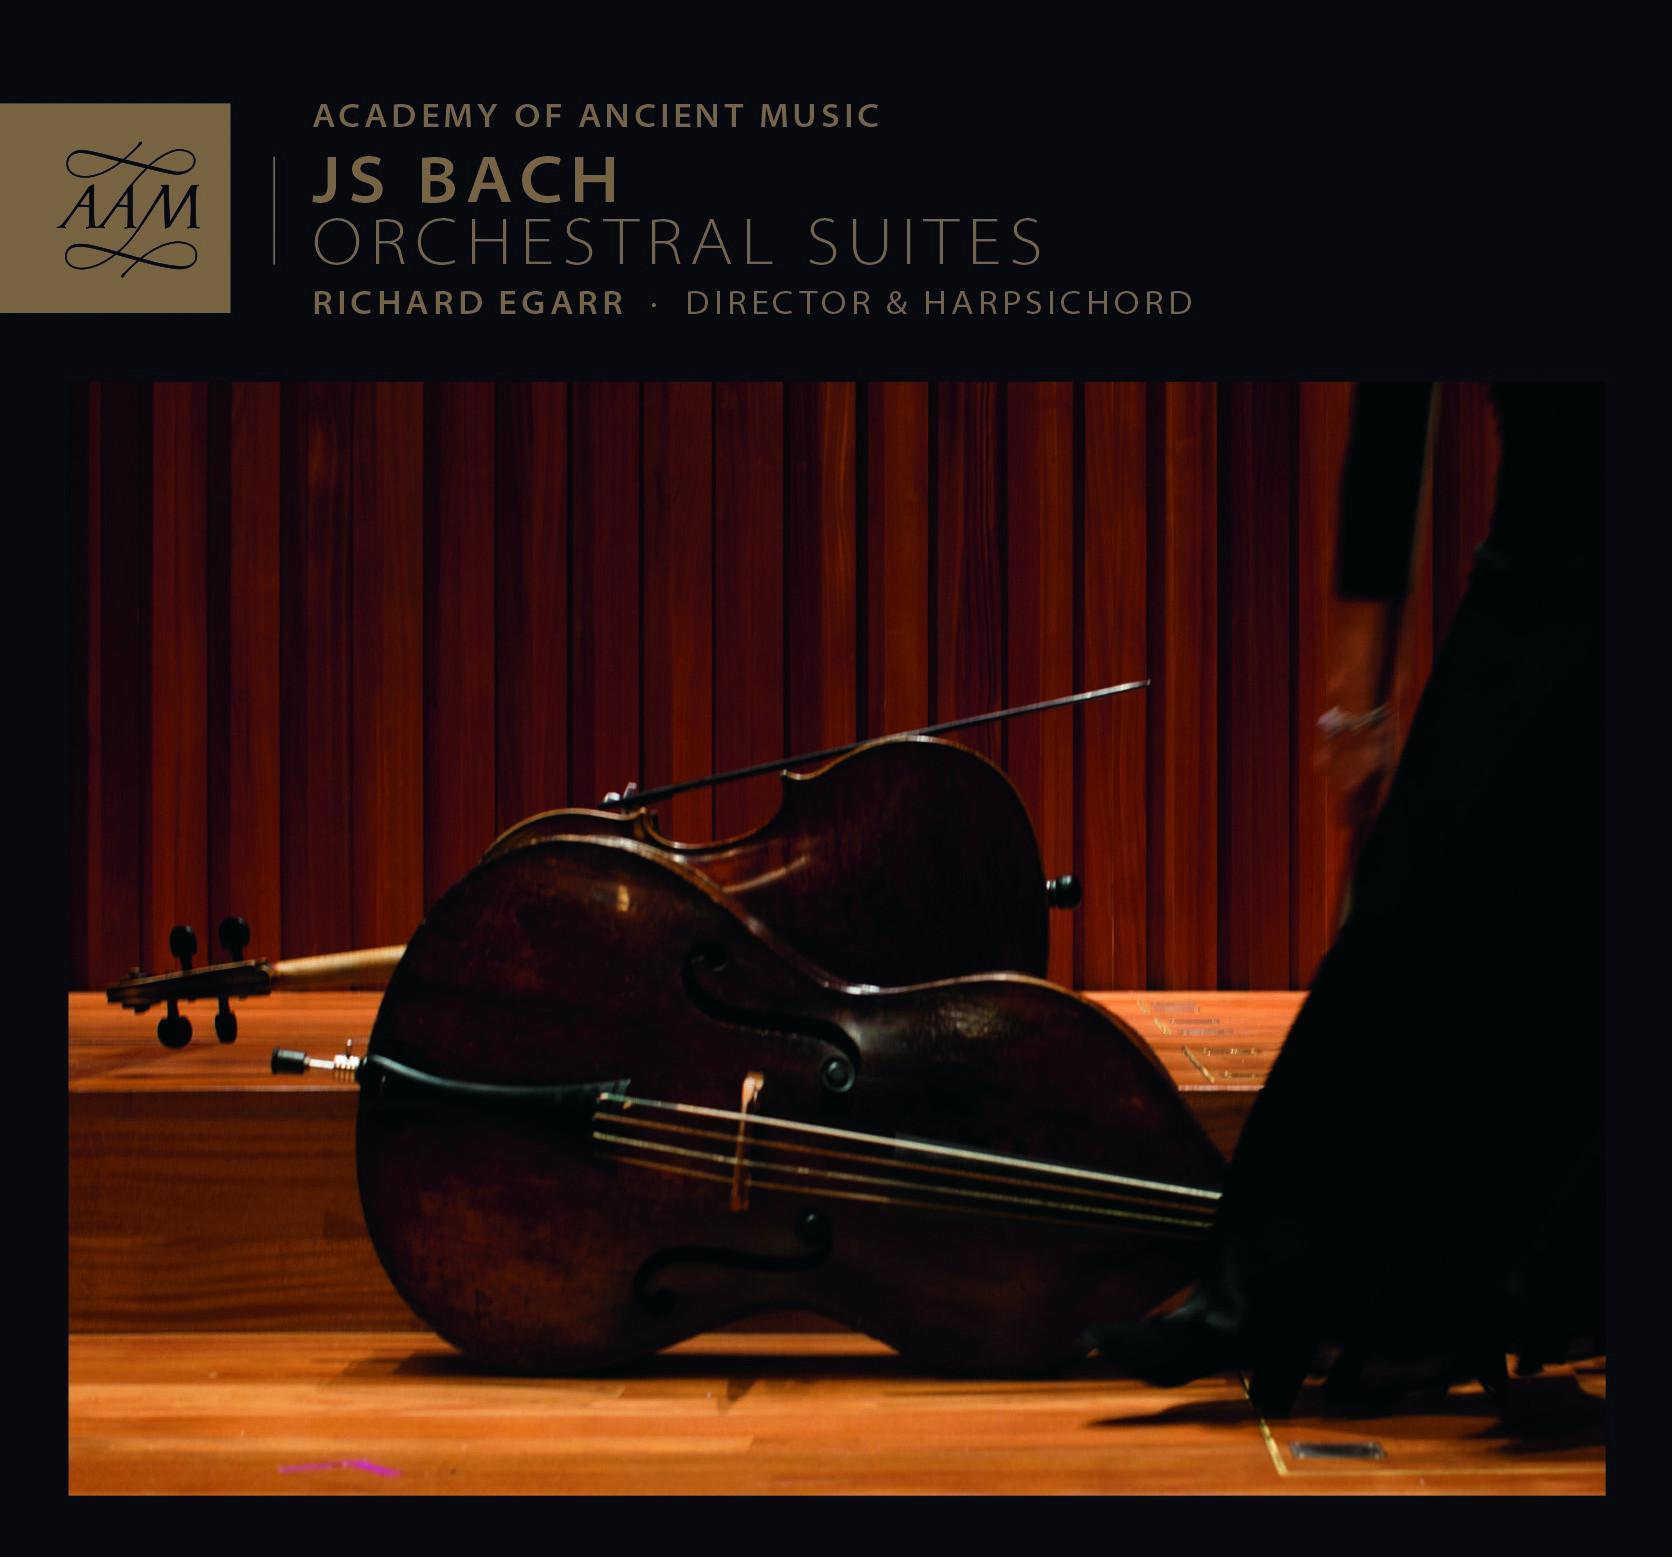 JS Bach: Orchestral Suites Nos. 1 - 4, BWV1066-1069